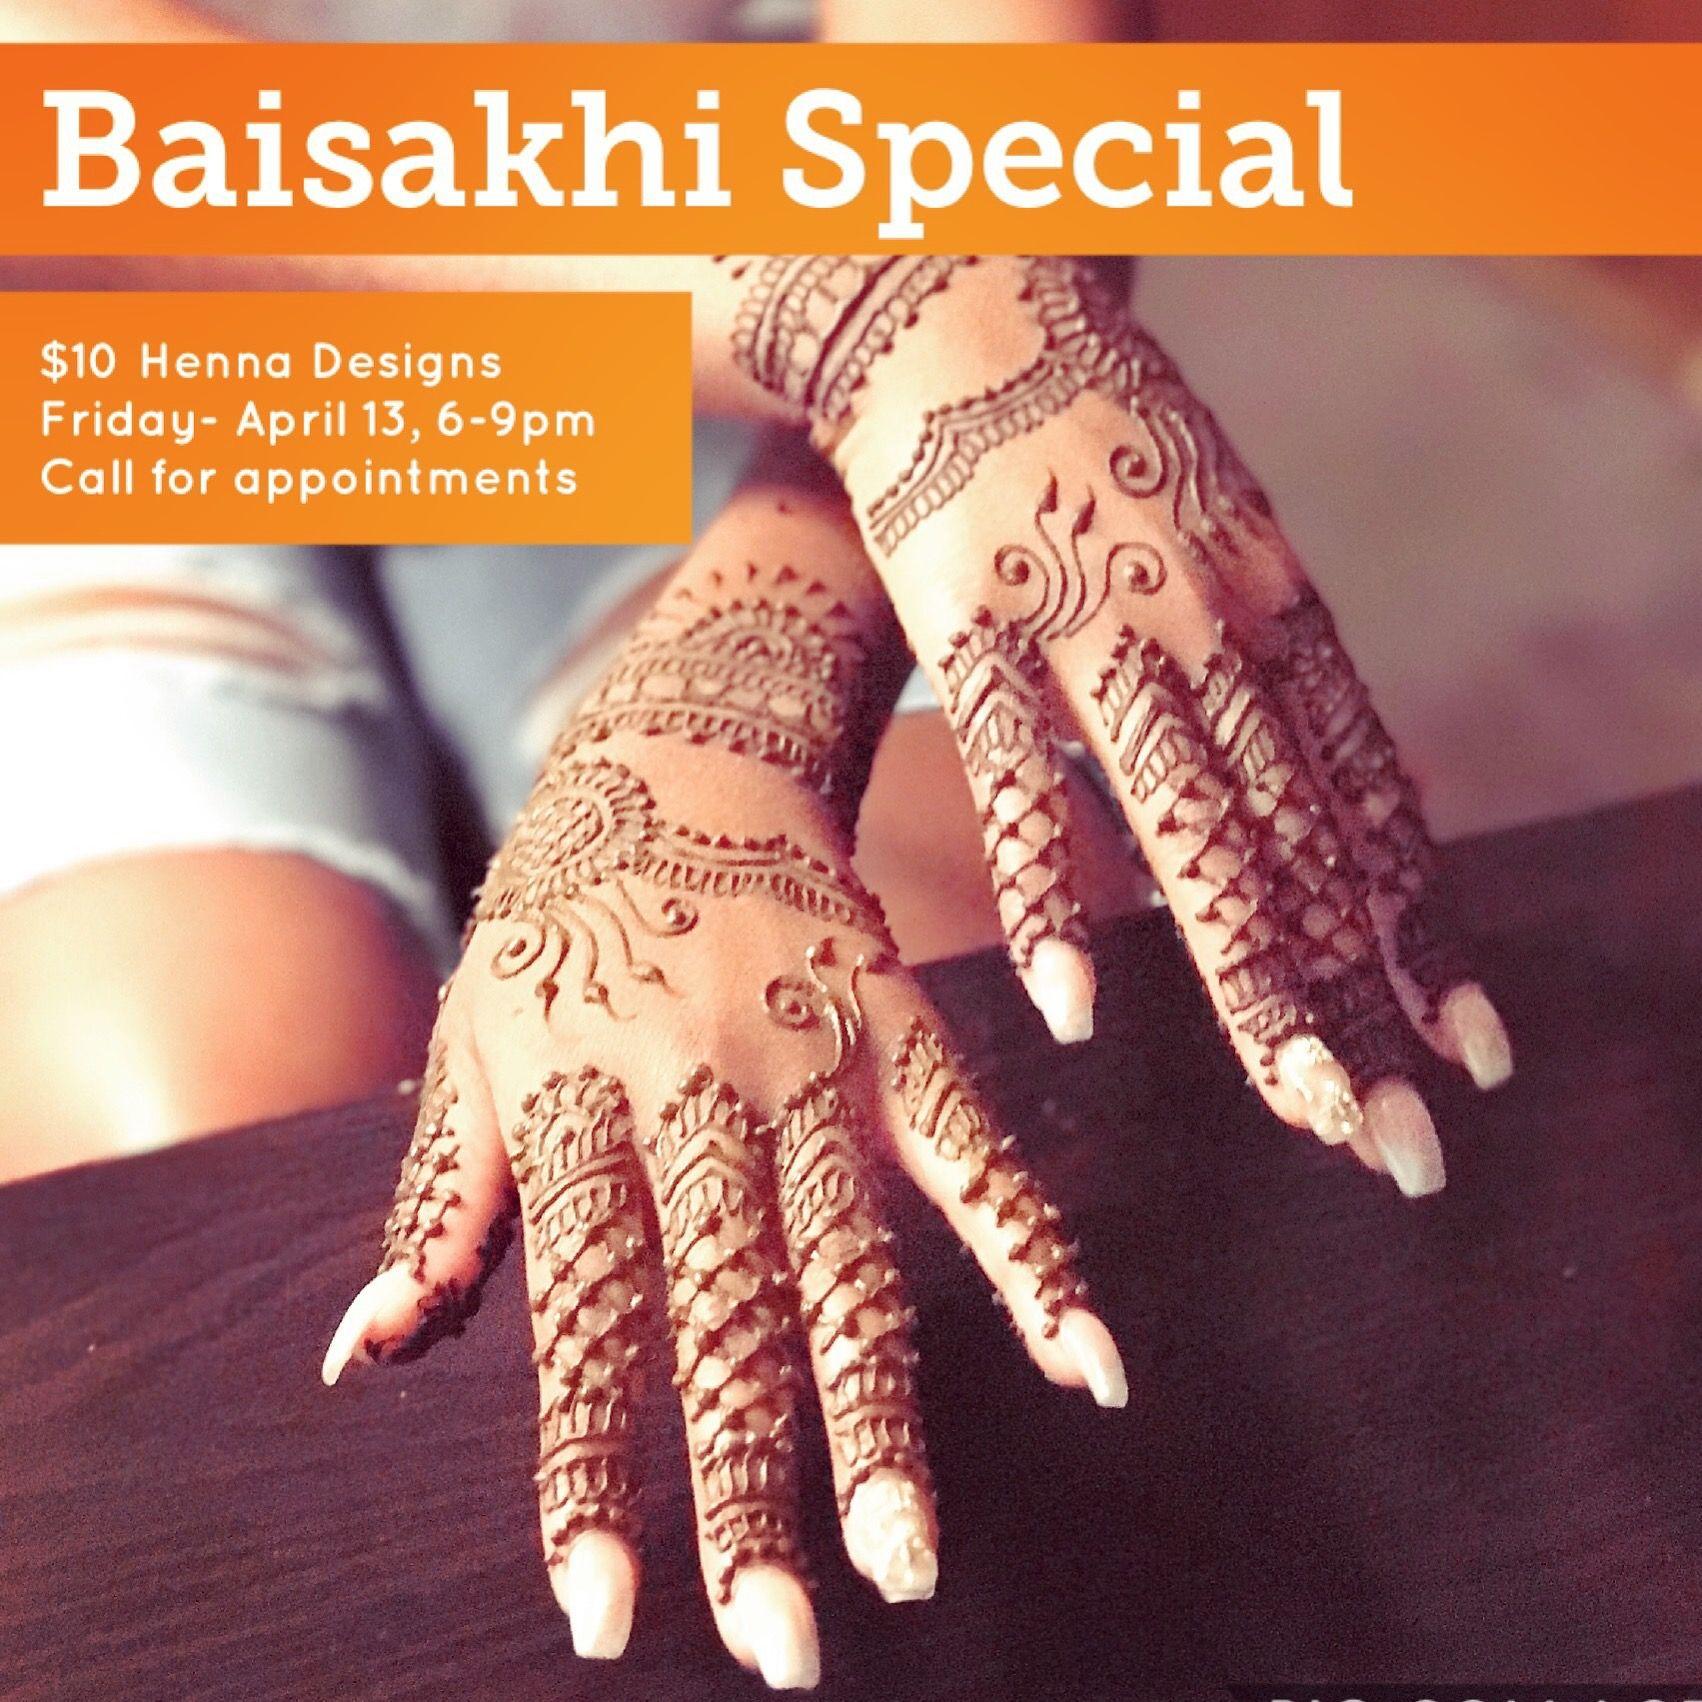 Baisakhi Special Event 10 Henna Designs all evening